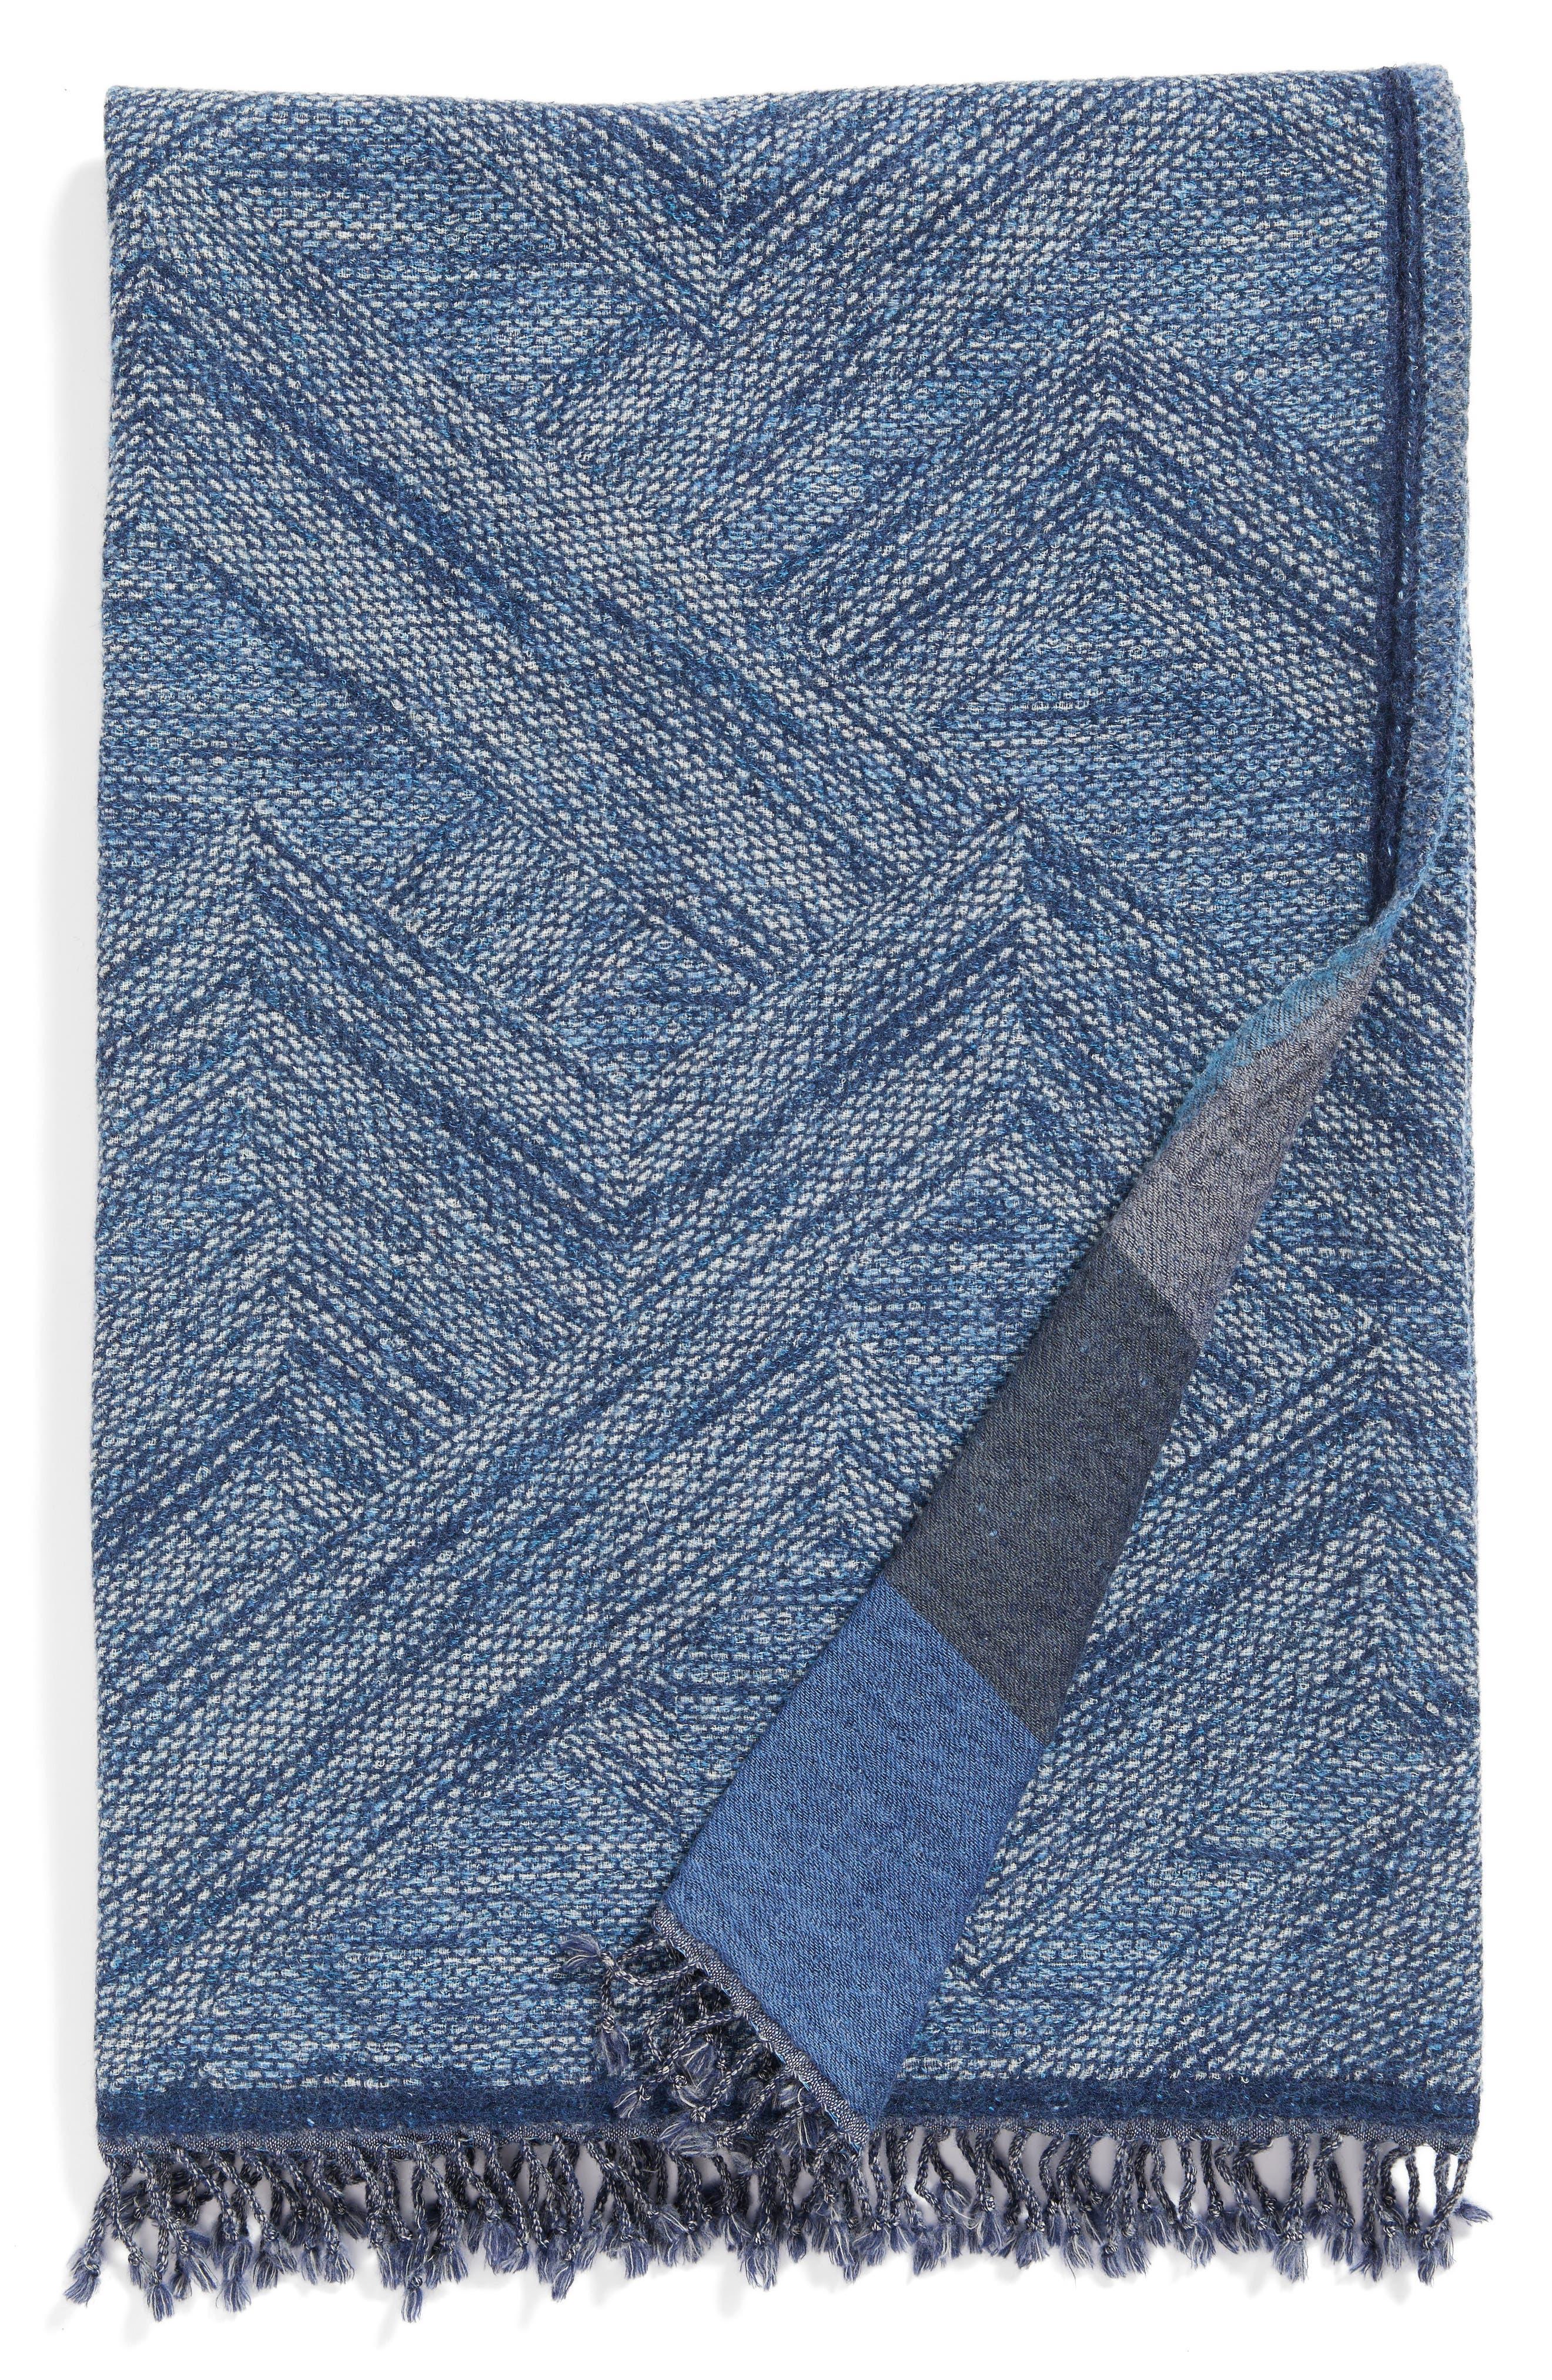 Main Image - Modern Staples Chevron Double Face Merino Wool Throw